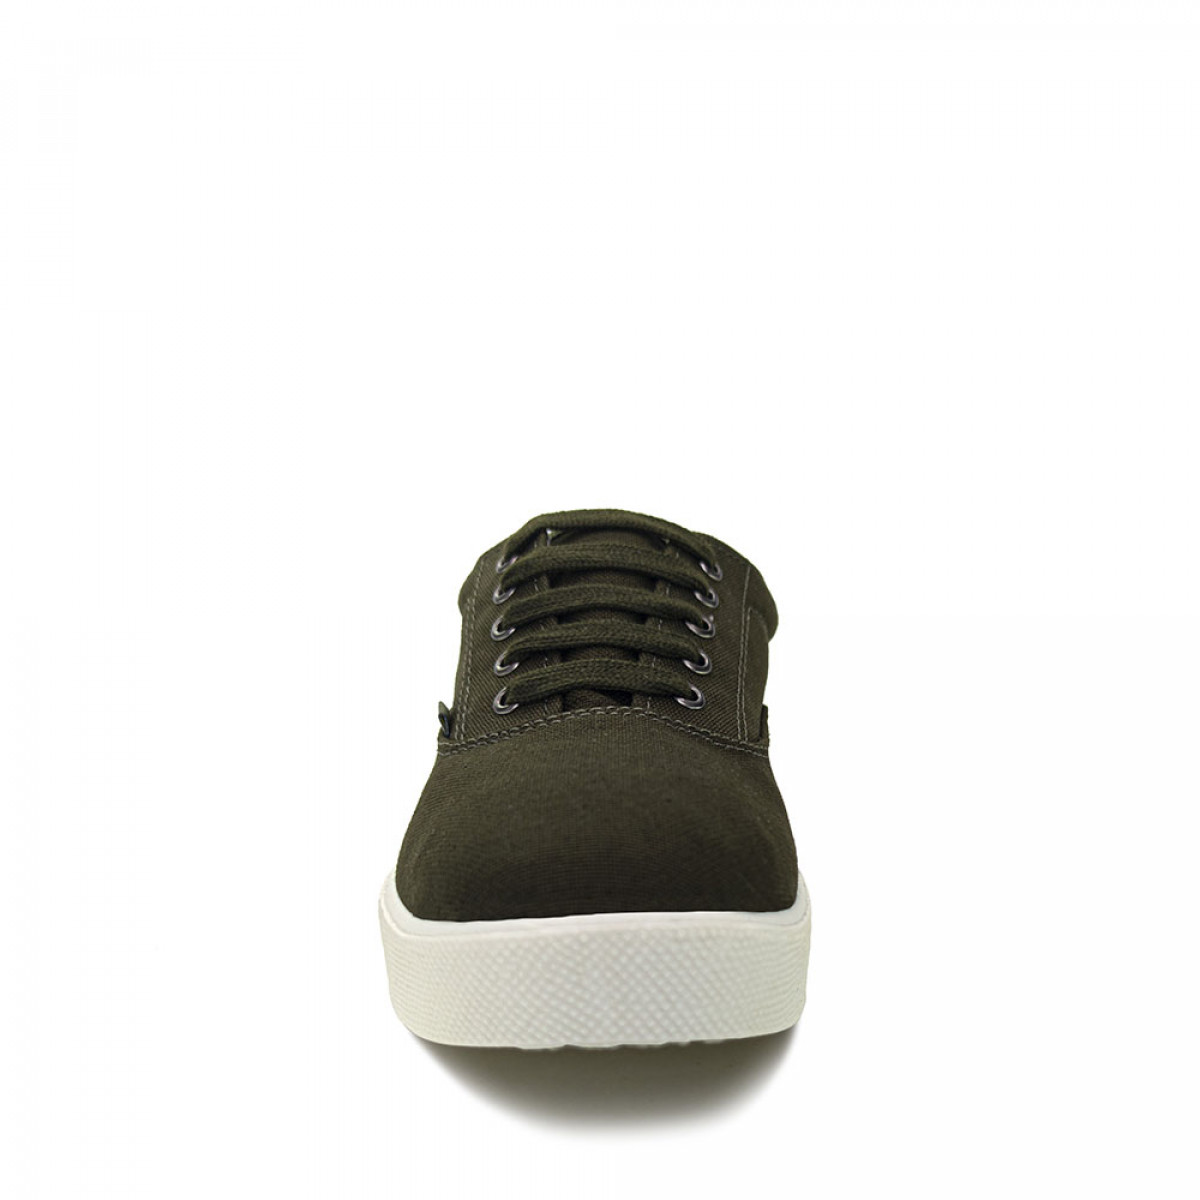 Sneakers TAYLOR, Khaki